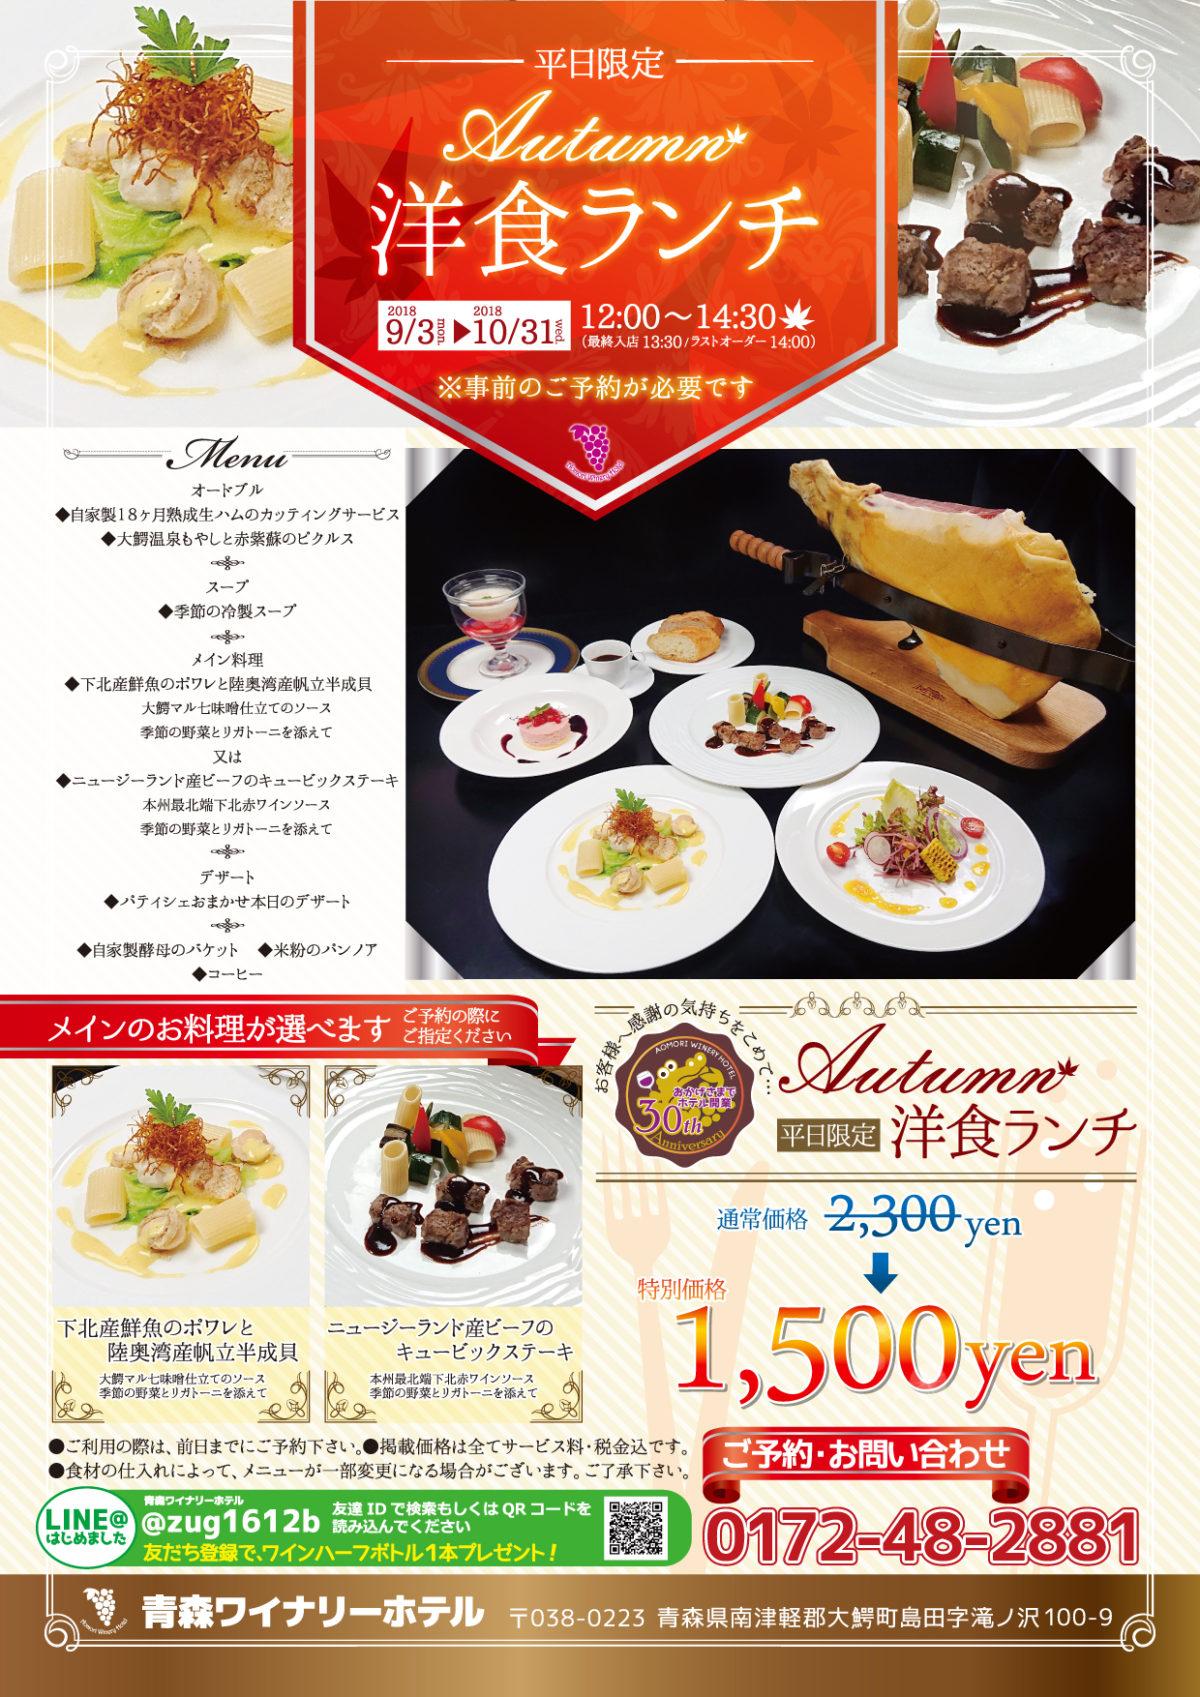 Autumn洋食ランチのお知らせ